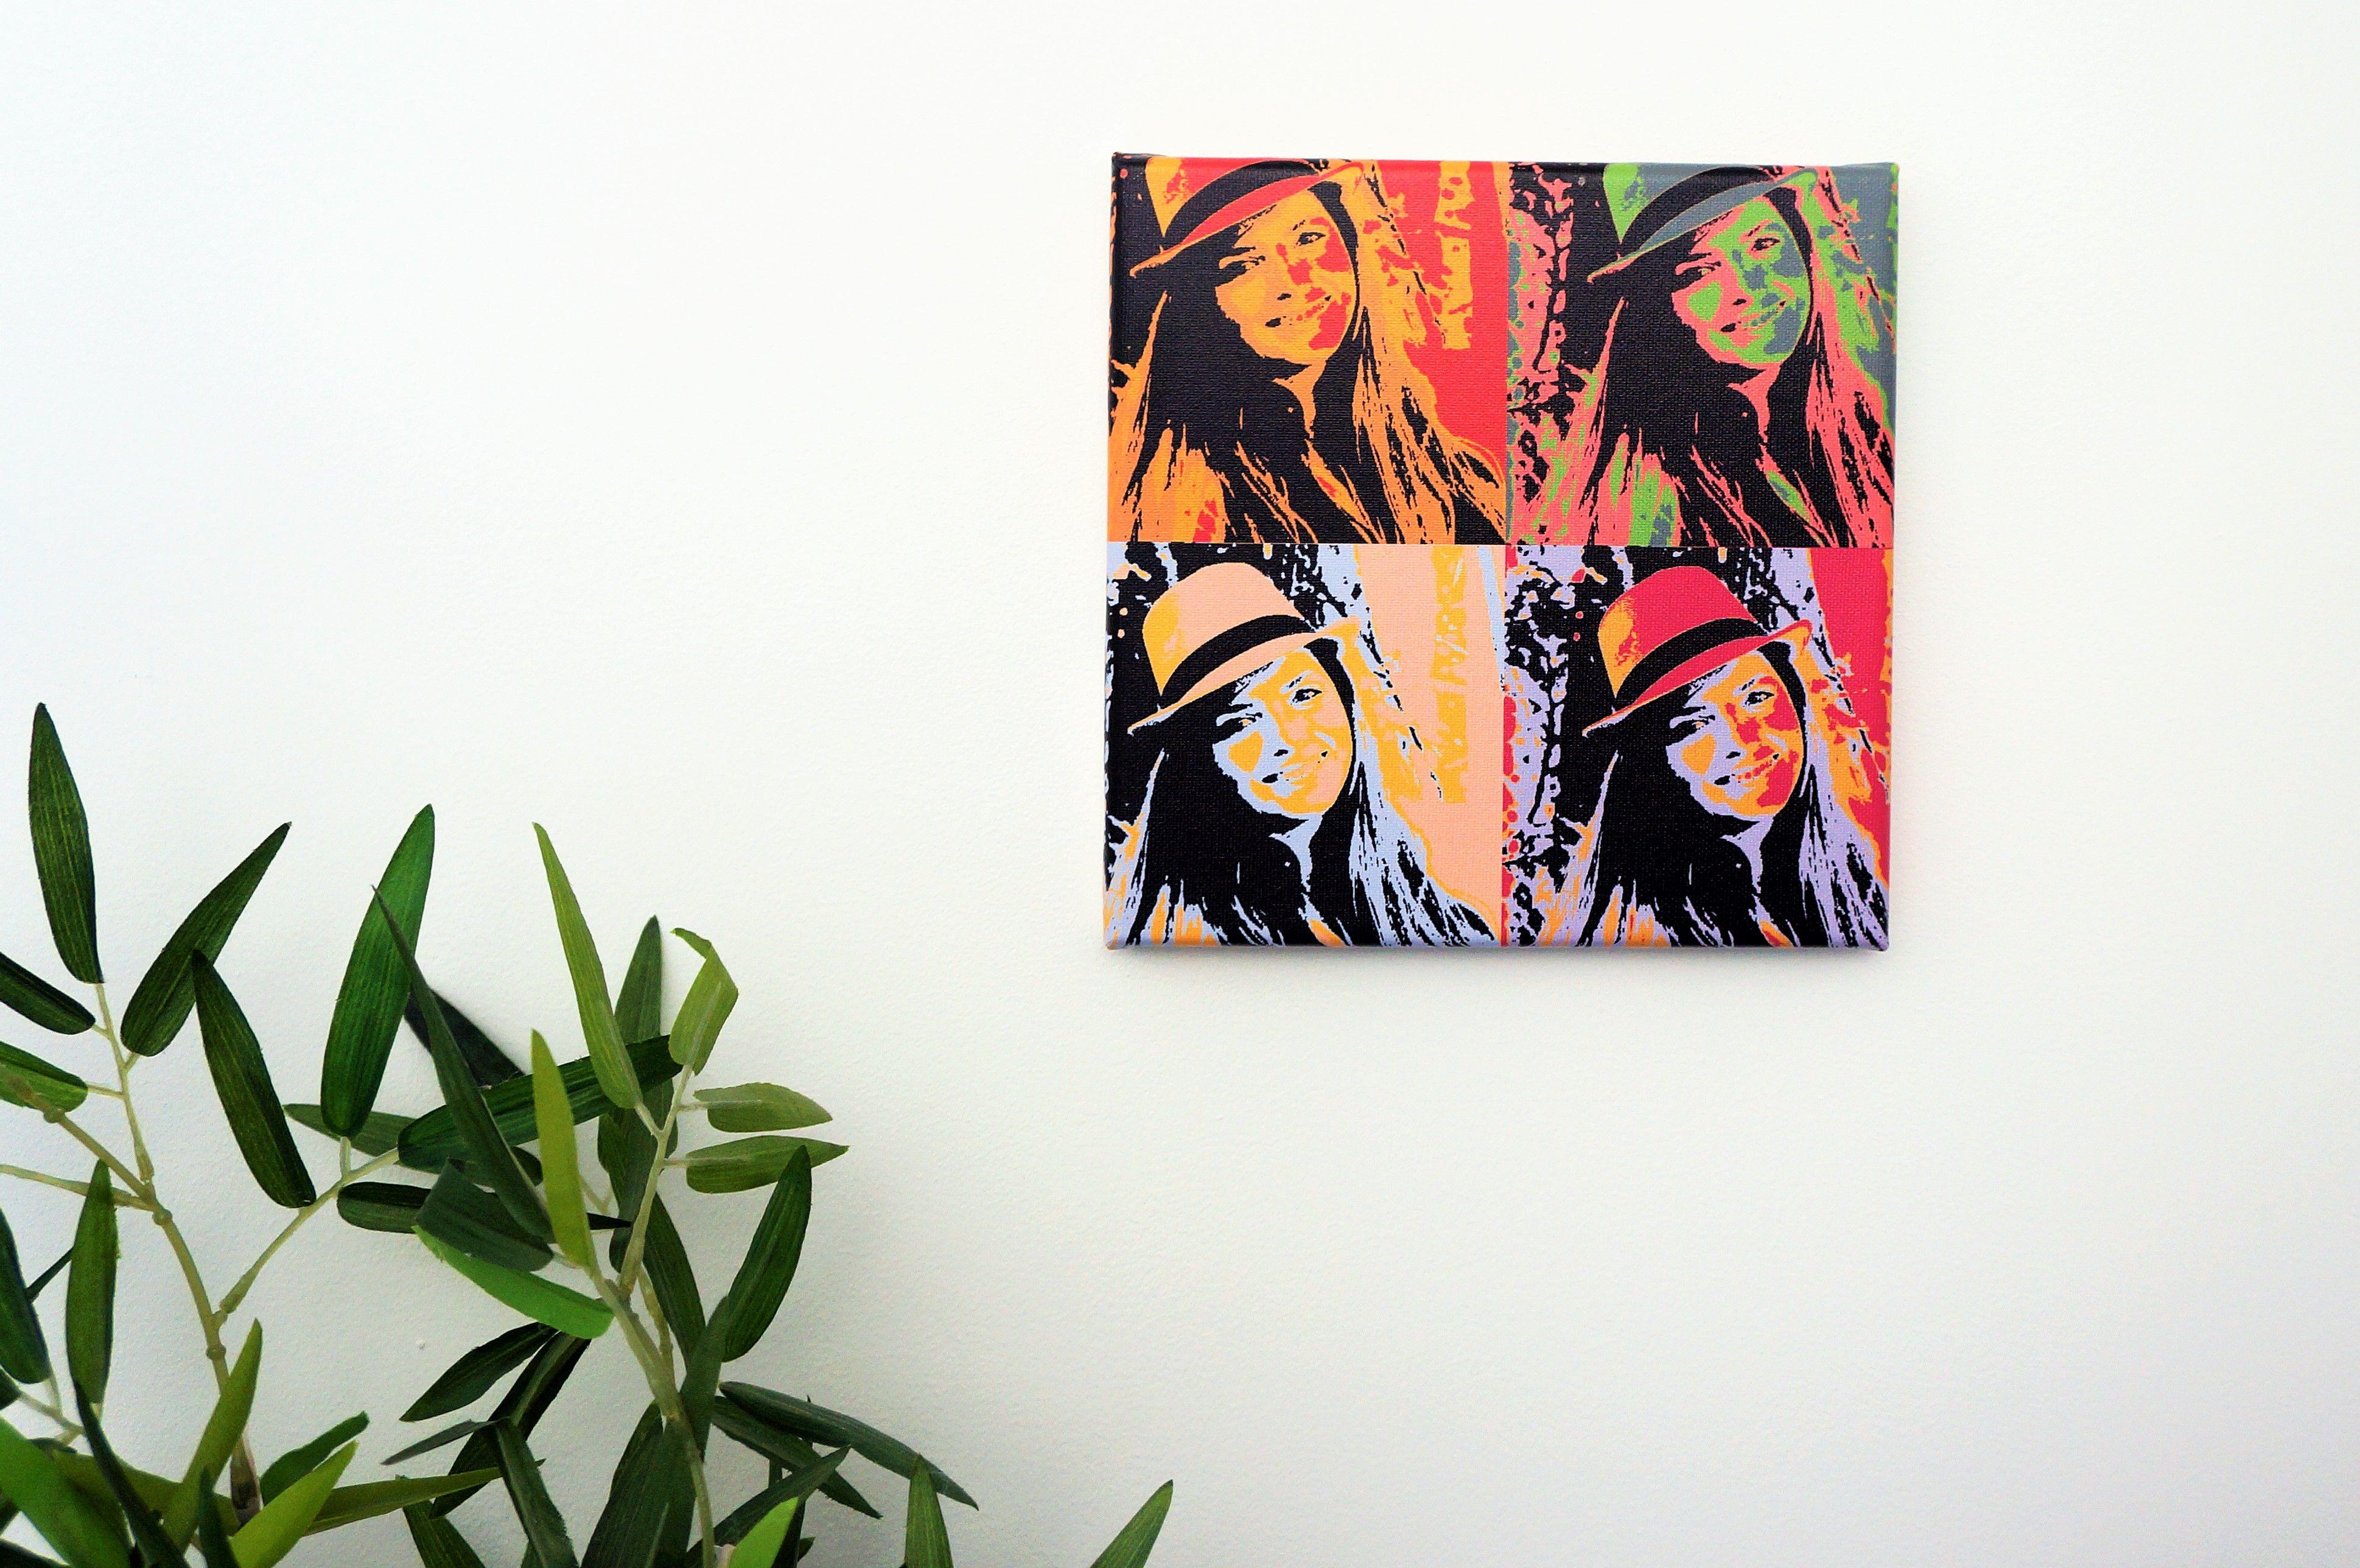 tableau pop art toile personnalis 1 photo andy warhol toile. Black Bedroom Furniture Sets. Home Design Ideas